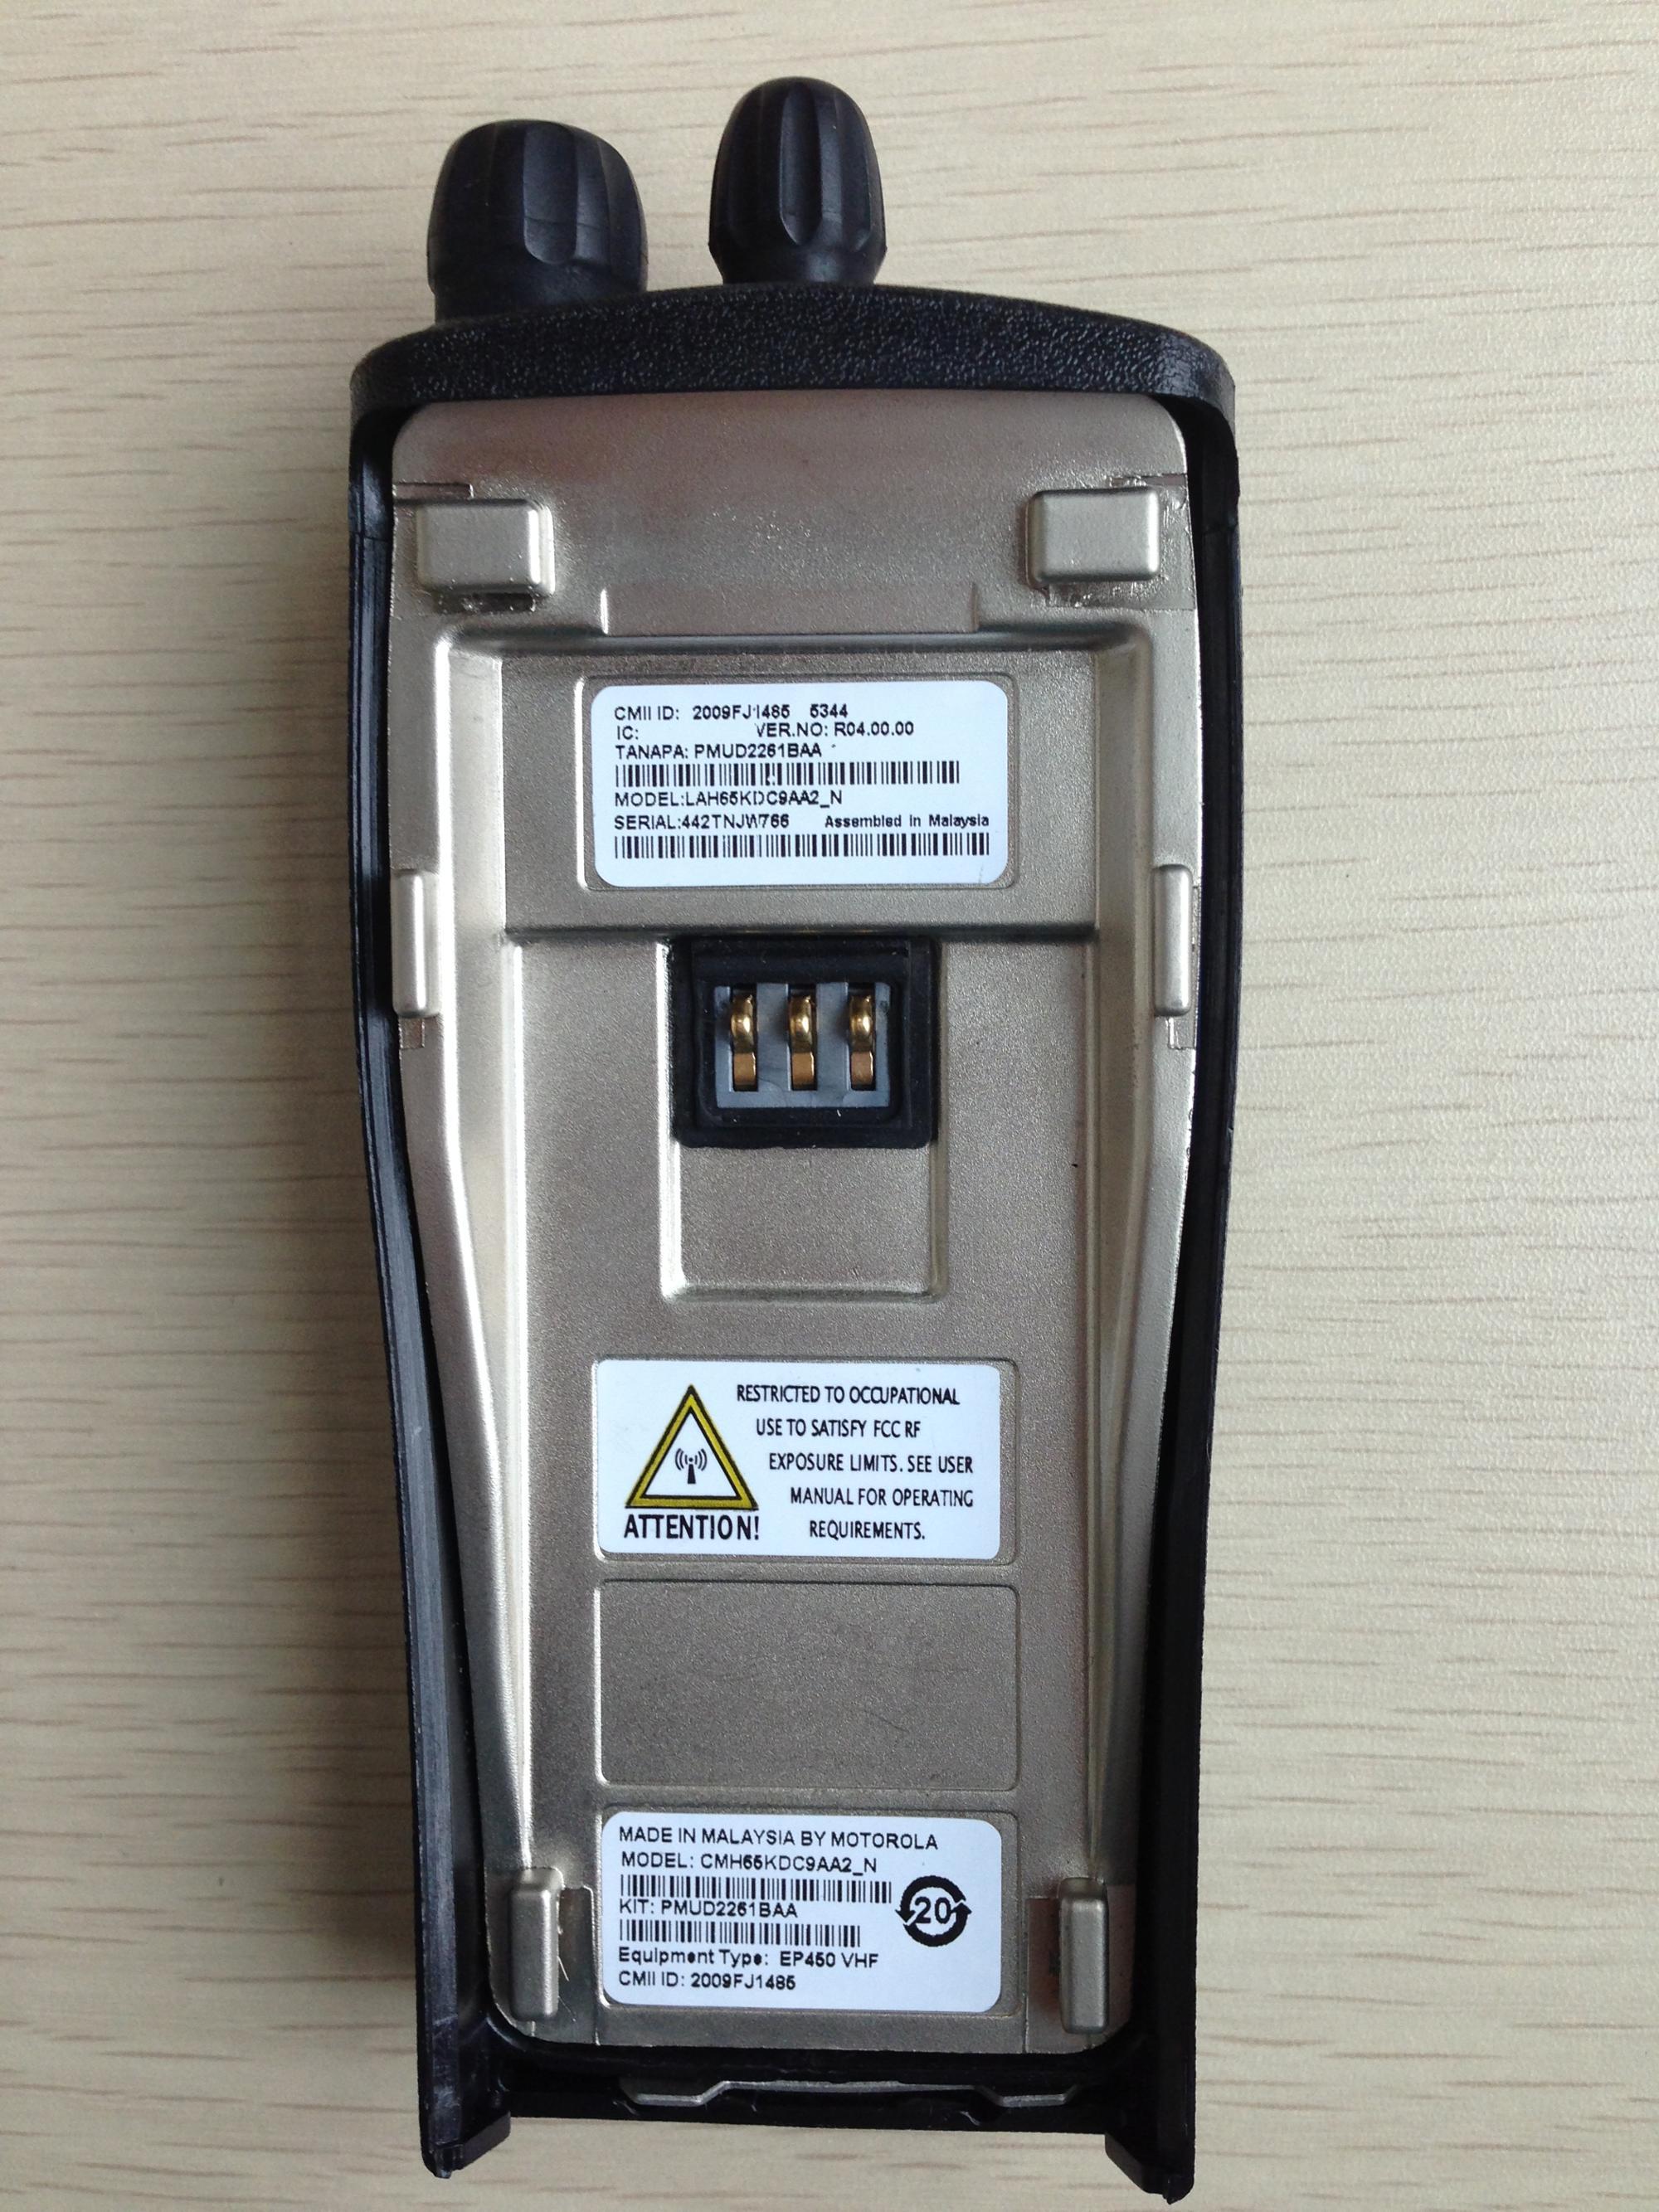 China Us Motorola, China Us Motorola Manufacturers and